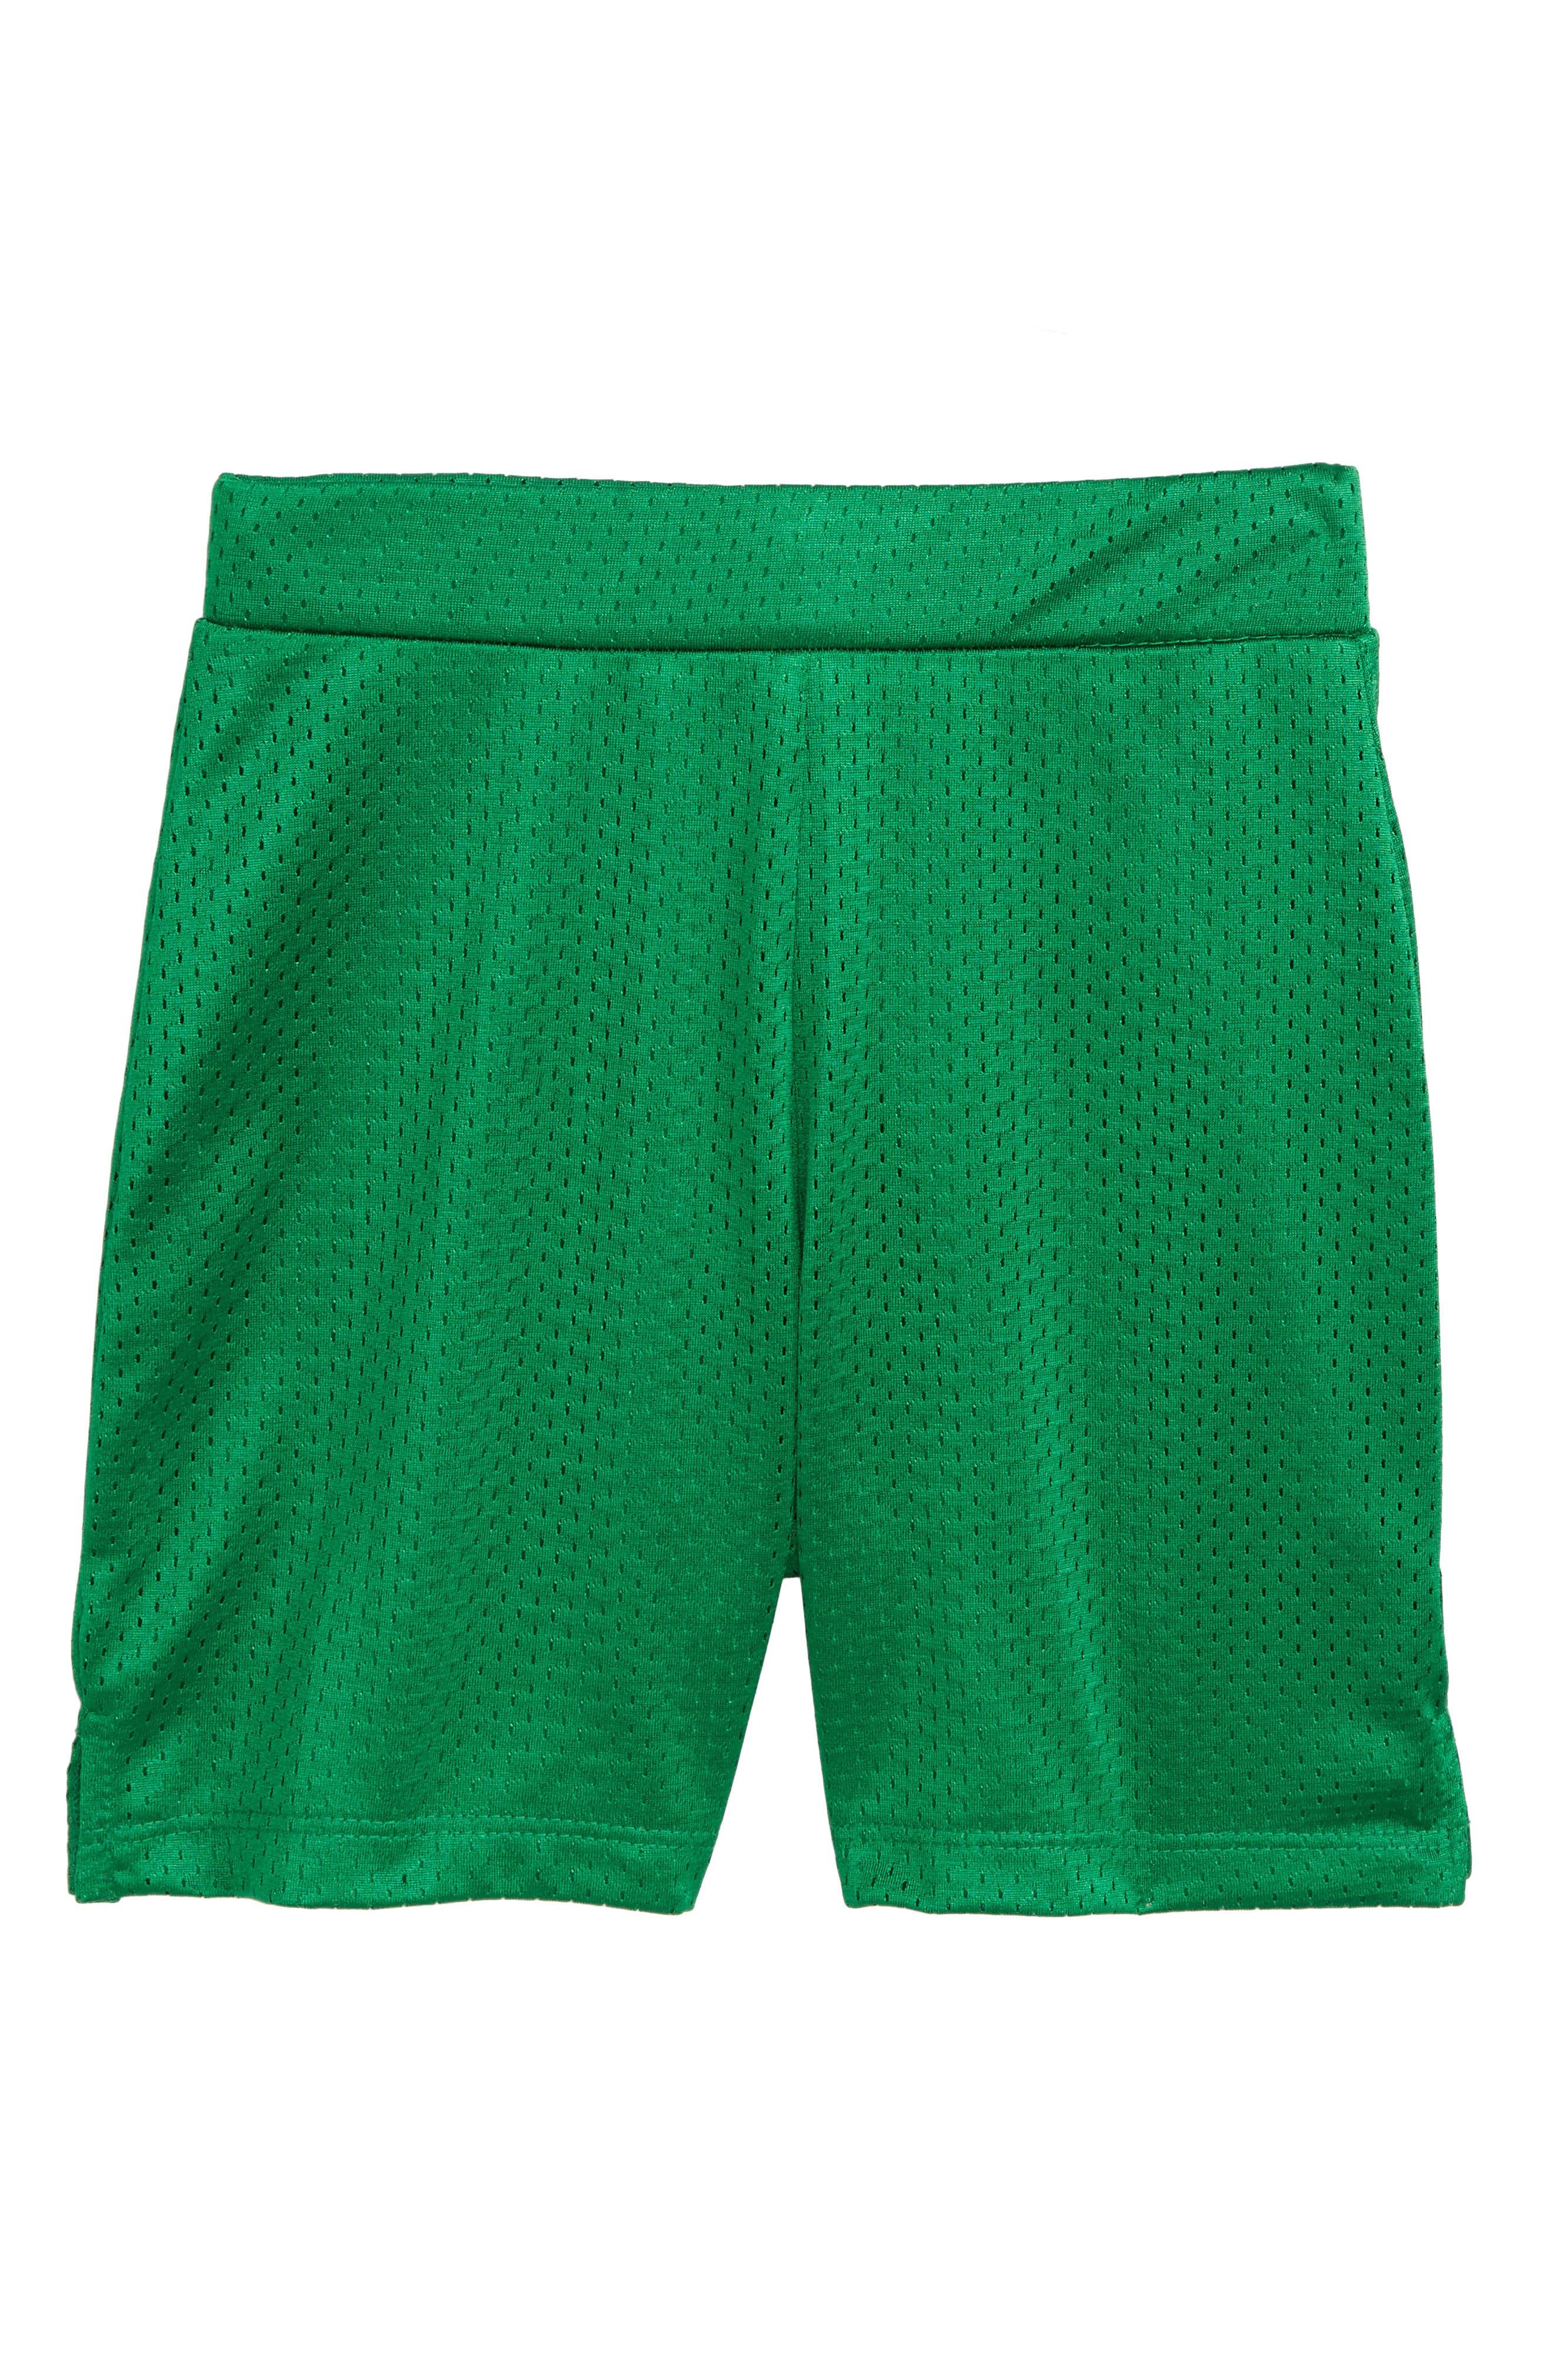 Alternate Image 1 Selected - Beru Nate Mesh Shorts (Toddler Boys & Little Boys)